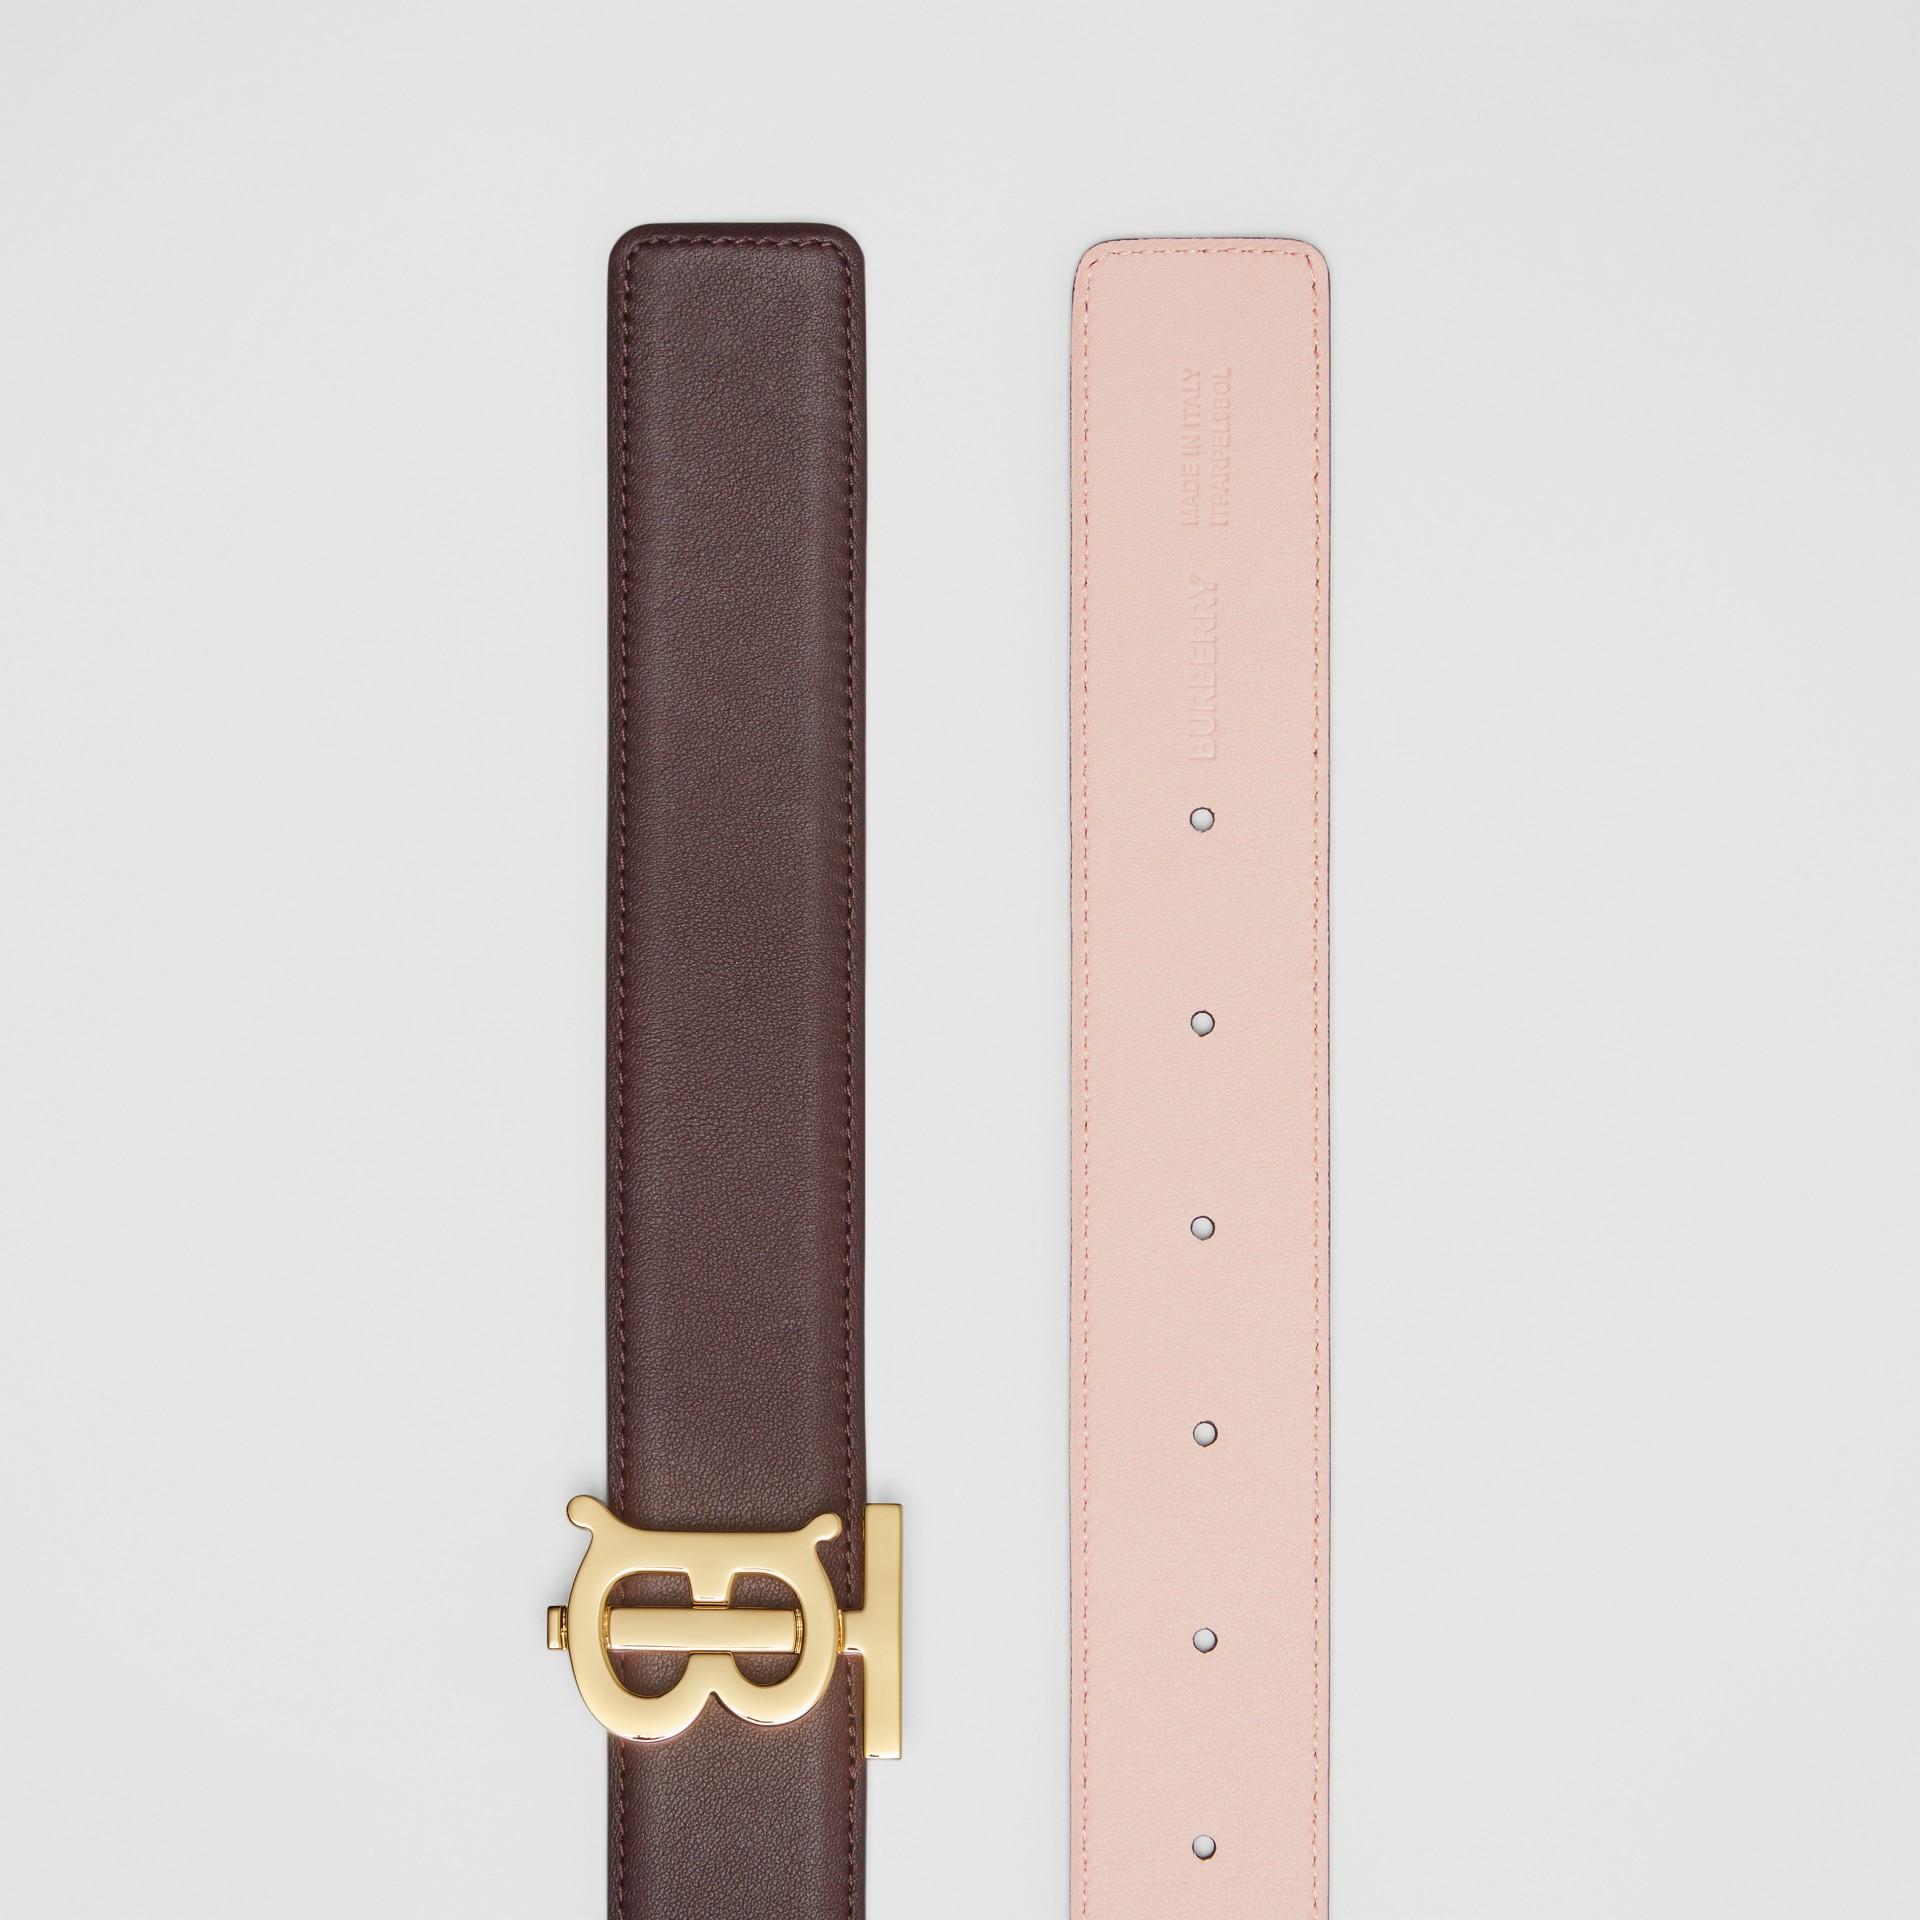 Reversible Monogram Motif Leather Belt in Oxblood/rose Beige - Women | Burberry - gallery image 6